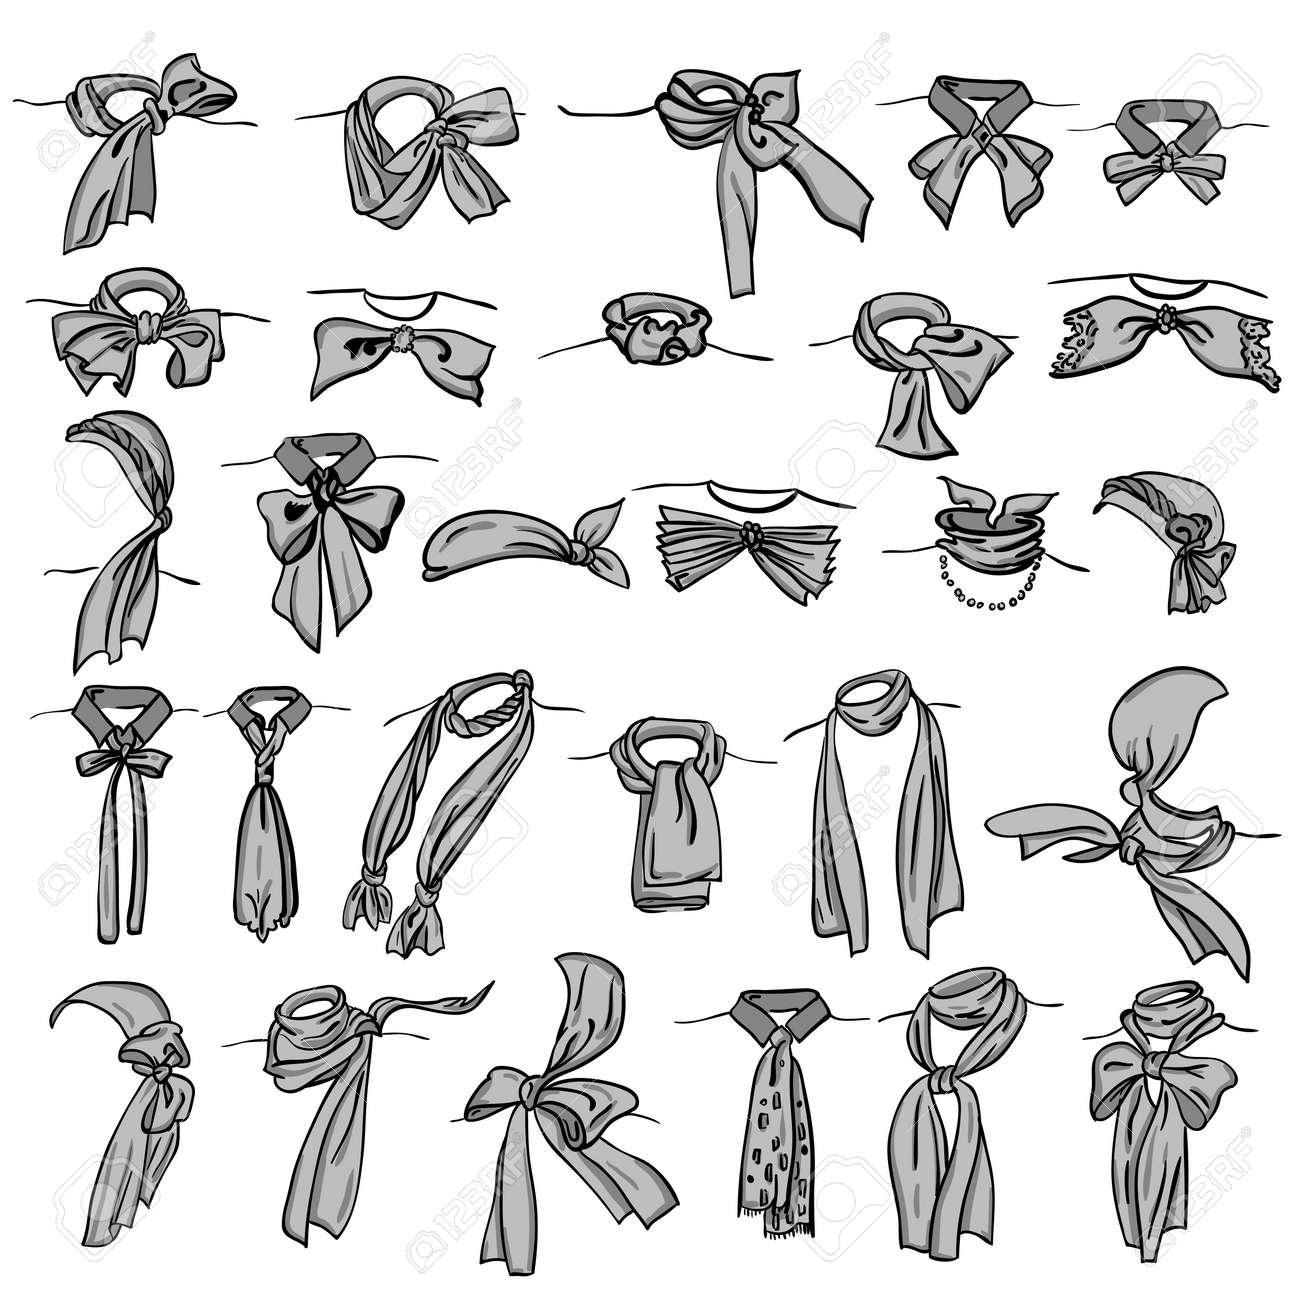 set of different neckerchiefs tied in different ways Stock Vector - 11027532